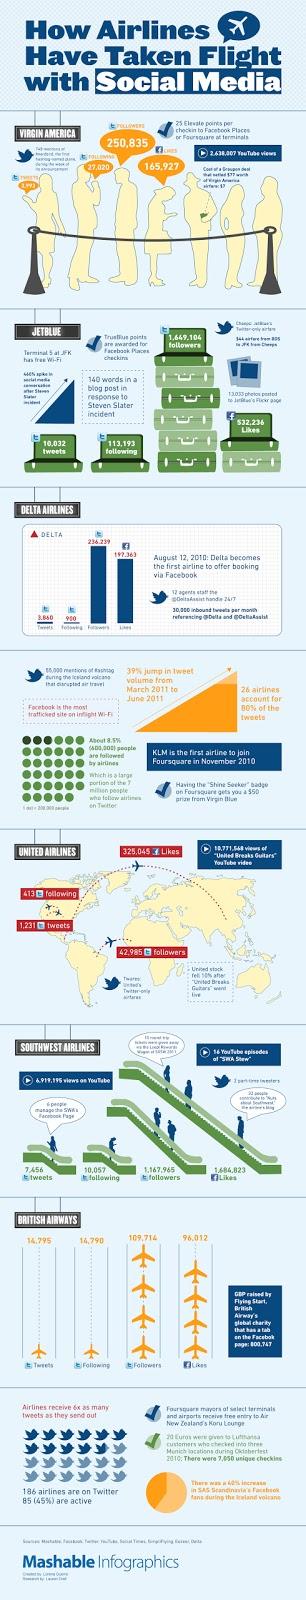 Airlines Using Social Media